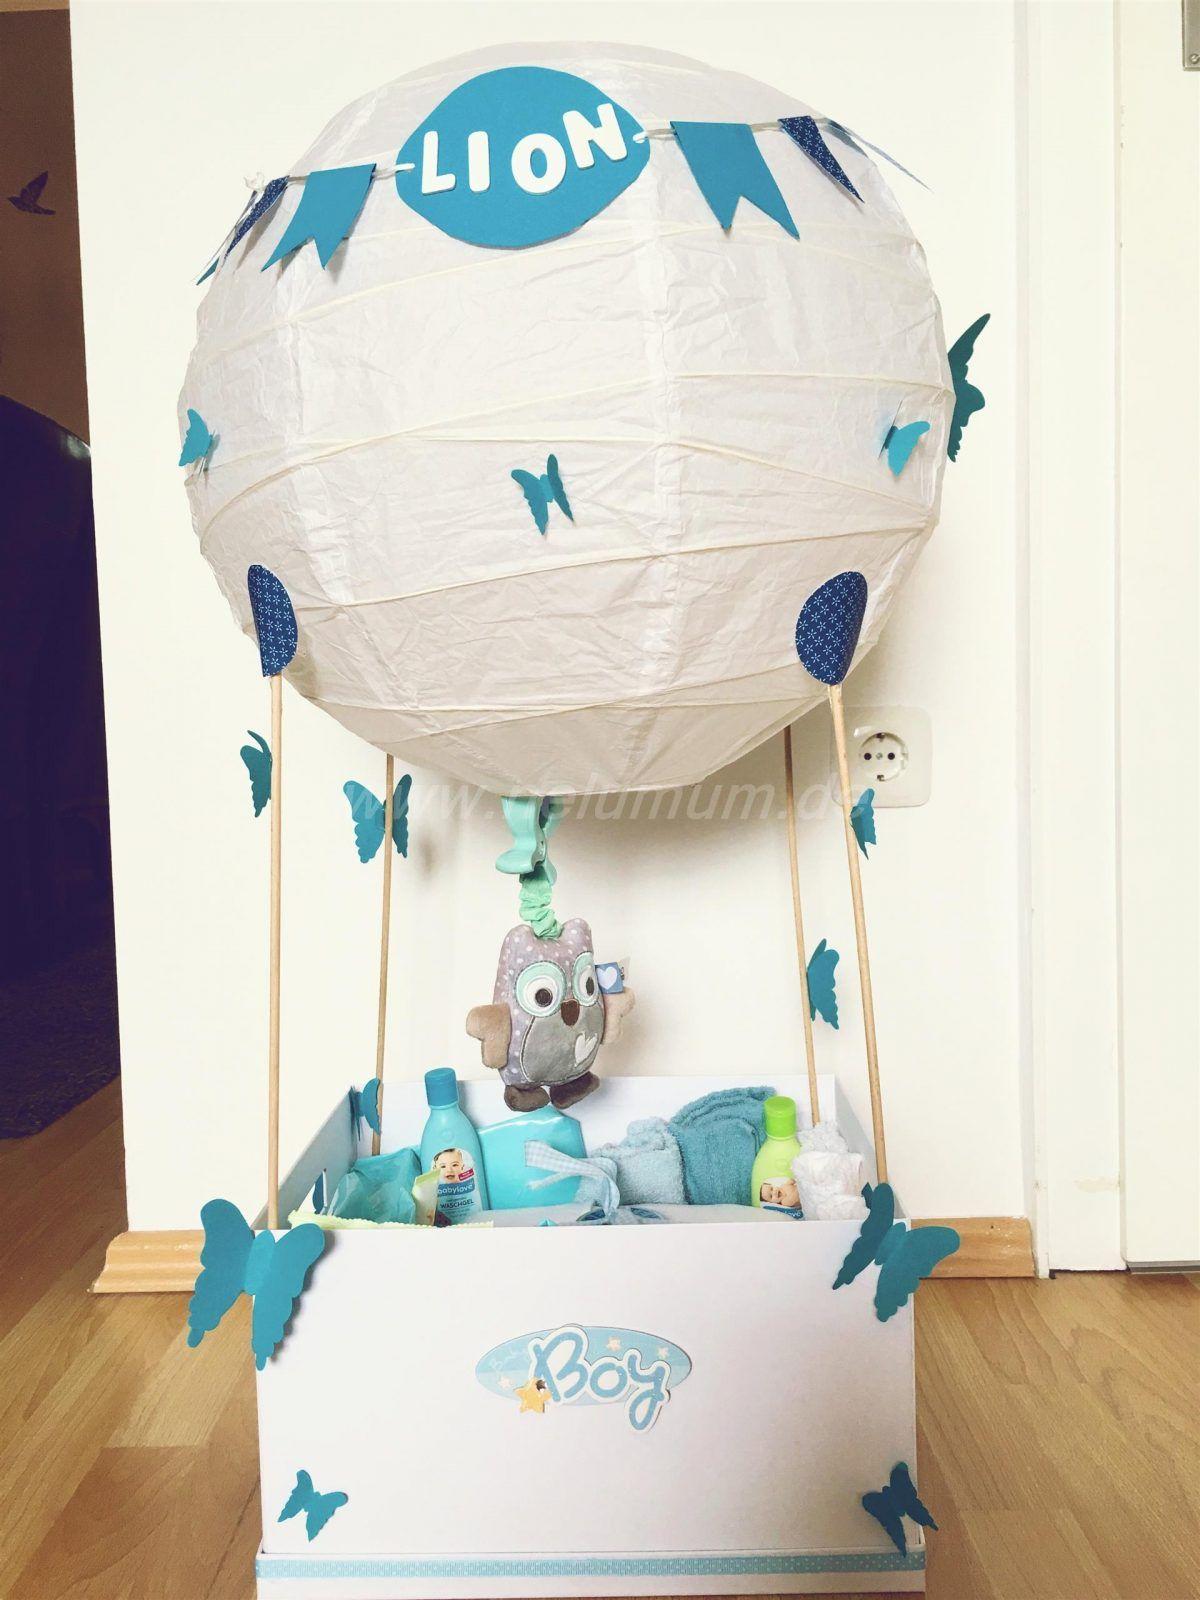 hei luftballon zur geburt besondere geschenkideen. Black Bedroom Furniture Sets. Home Design Ideas